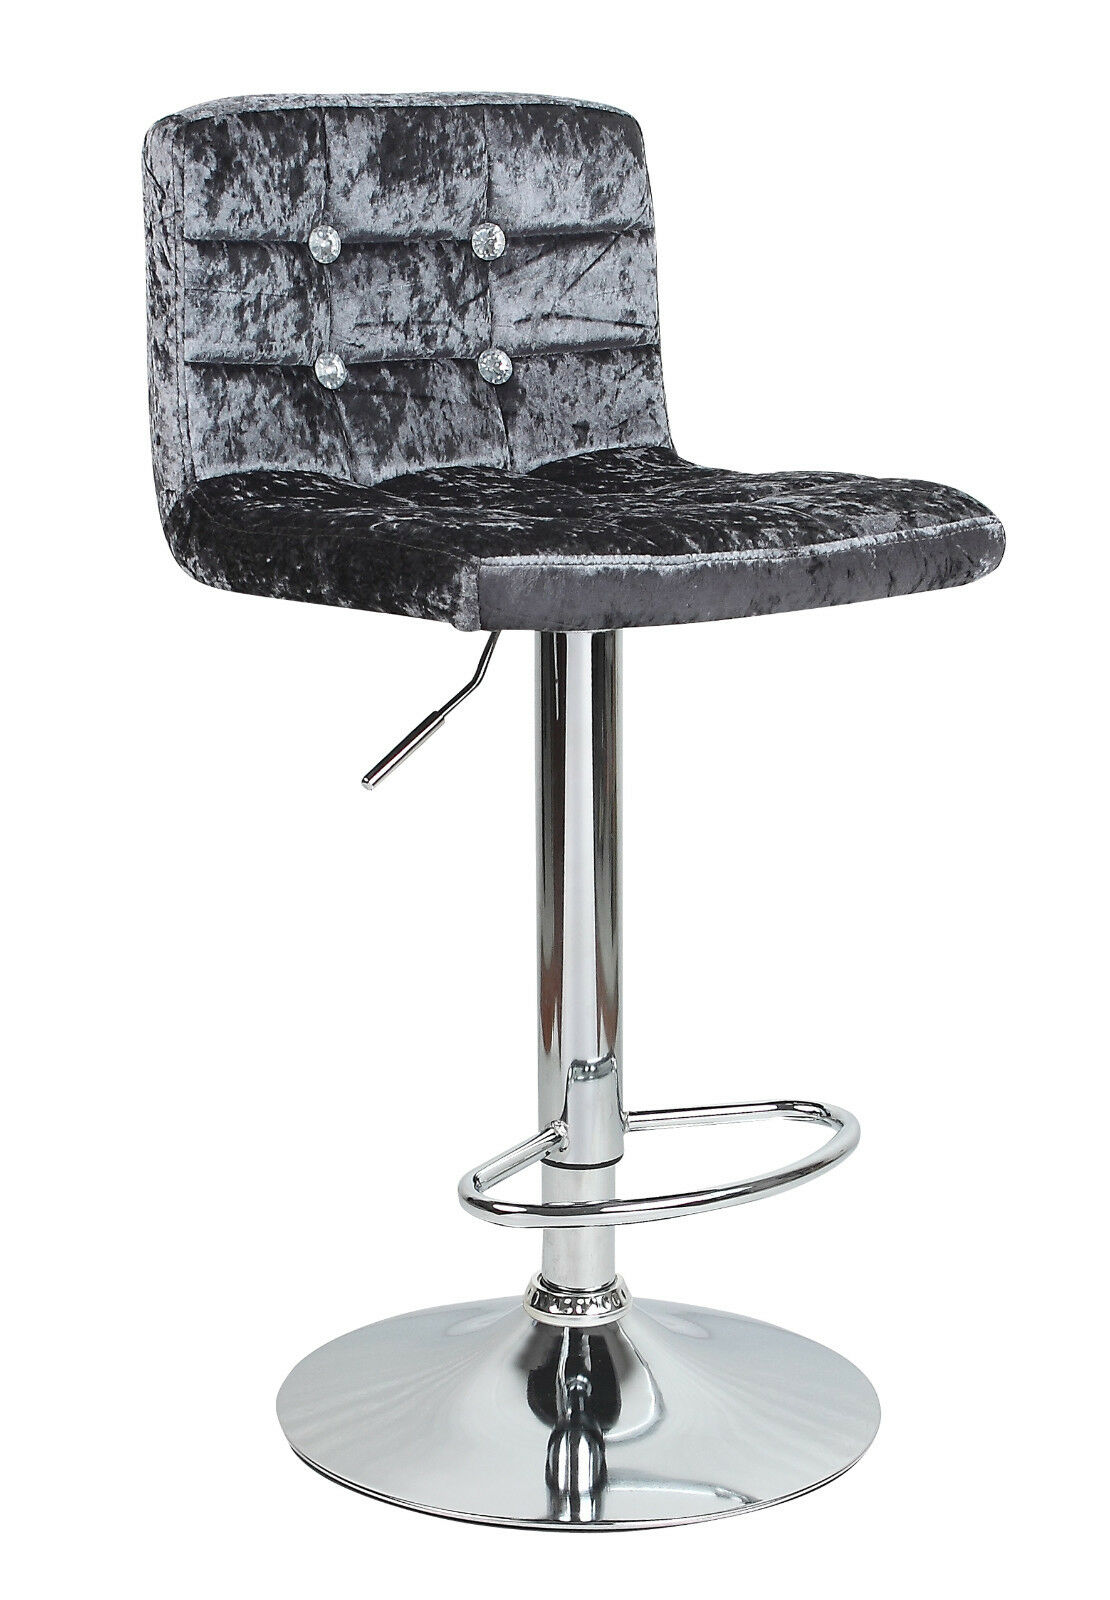 Chairs Diamante Crushed Velvet Bar Stool Swivel Foot Rest Chair ...